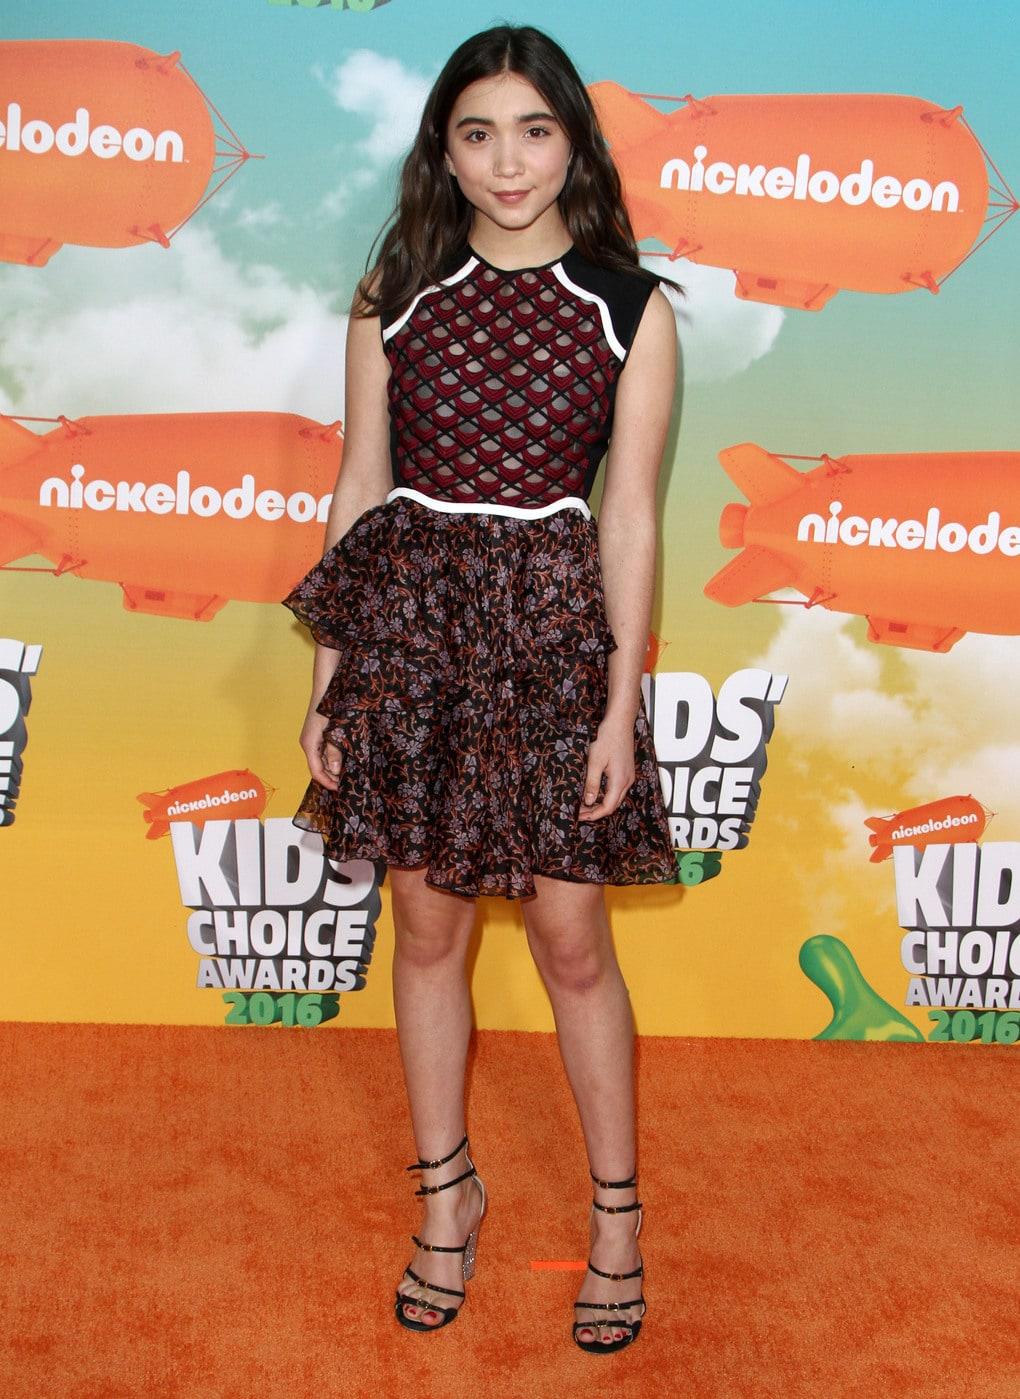 Rowan Blanchard at the Kids Choice Awards 2016